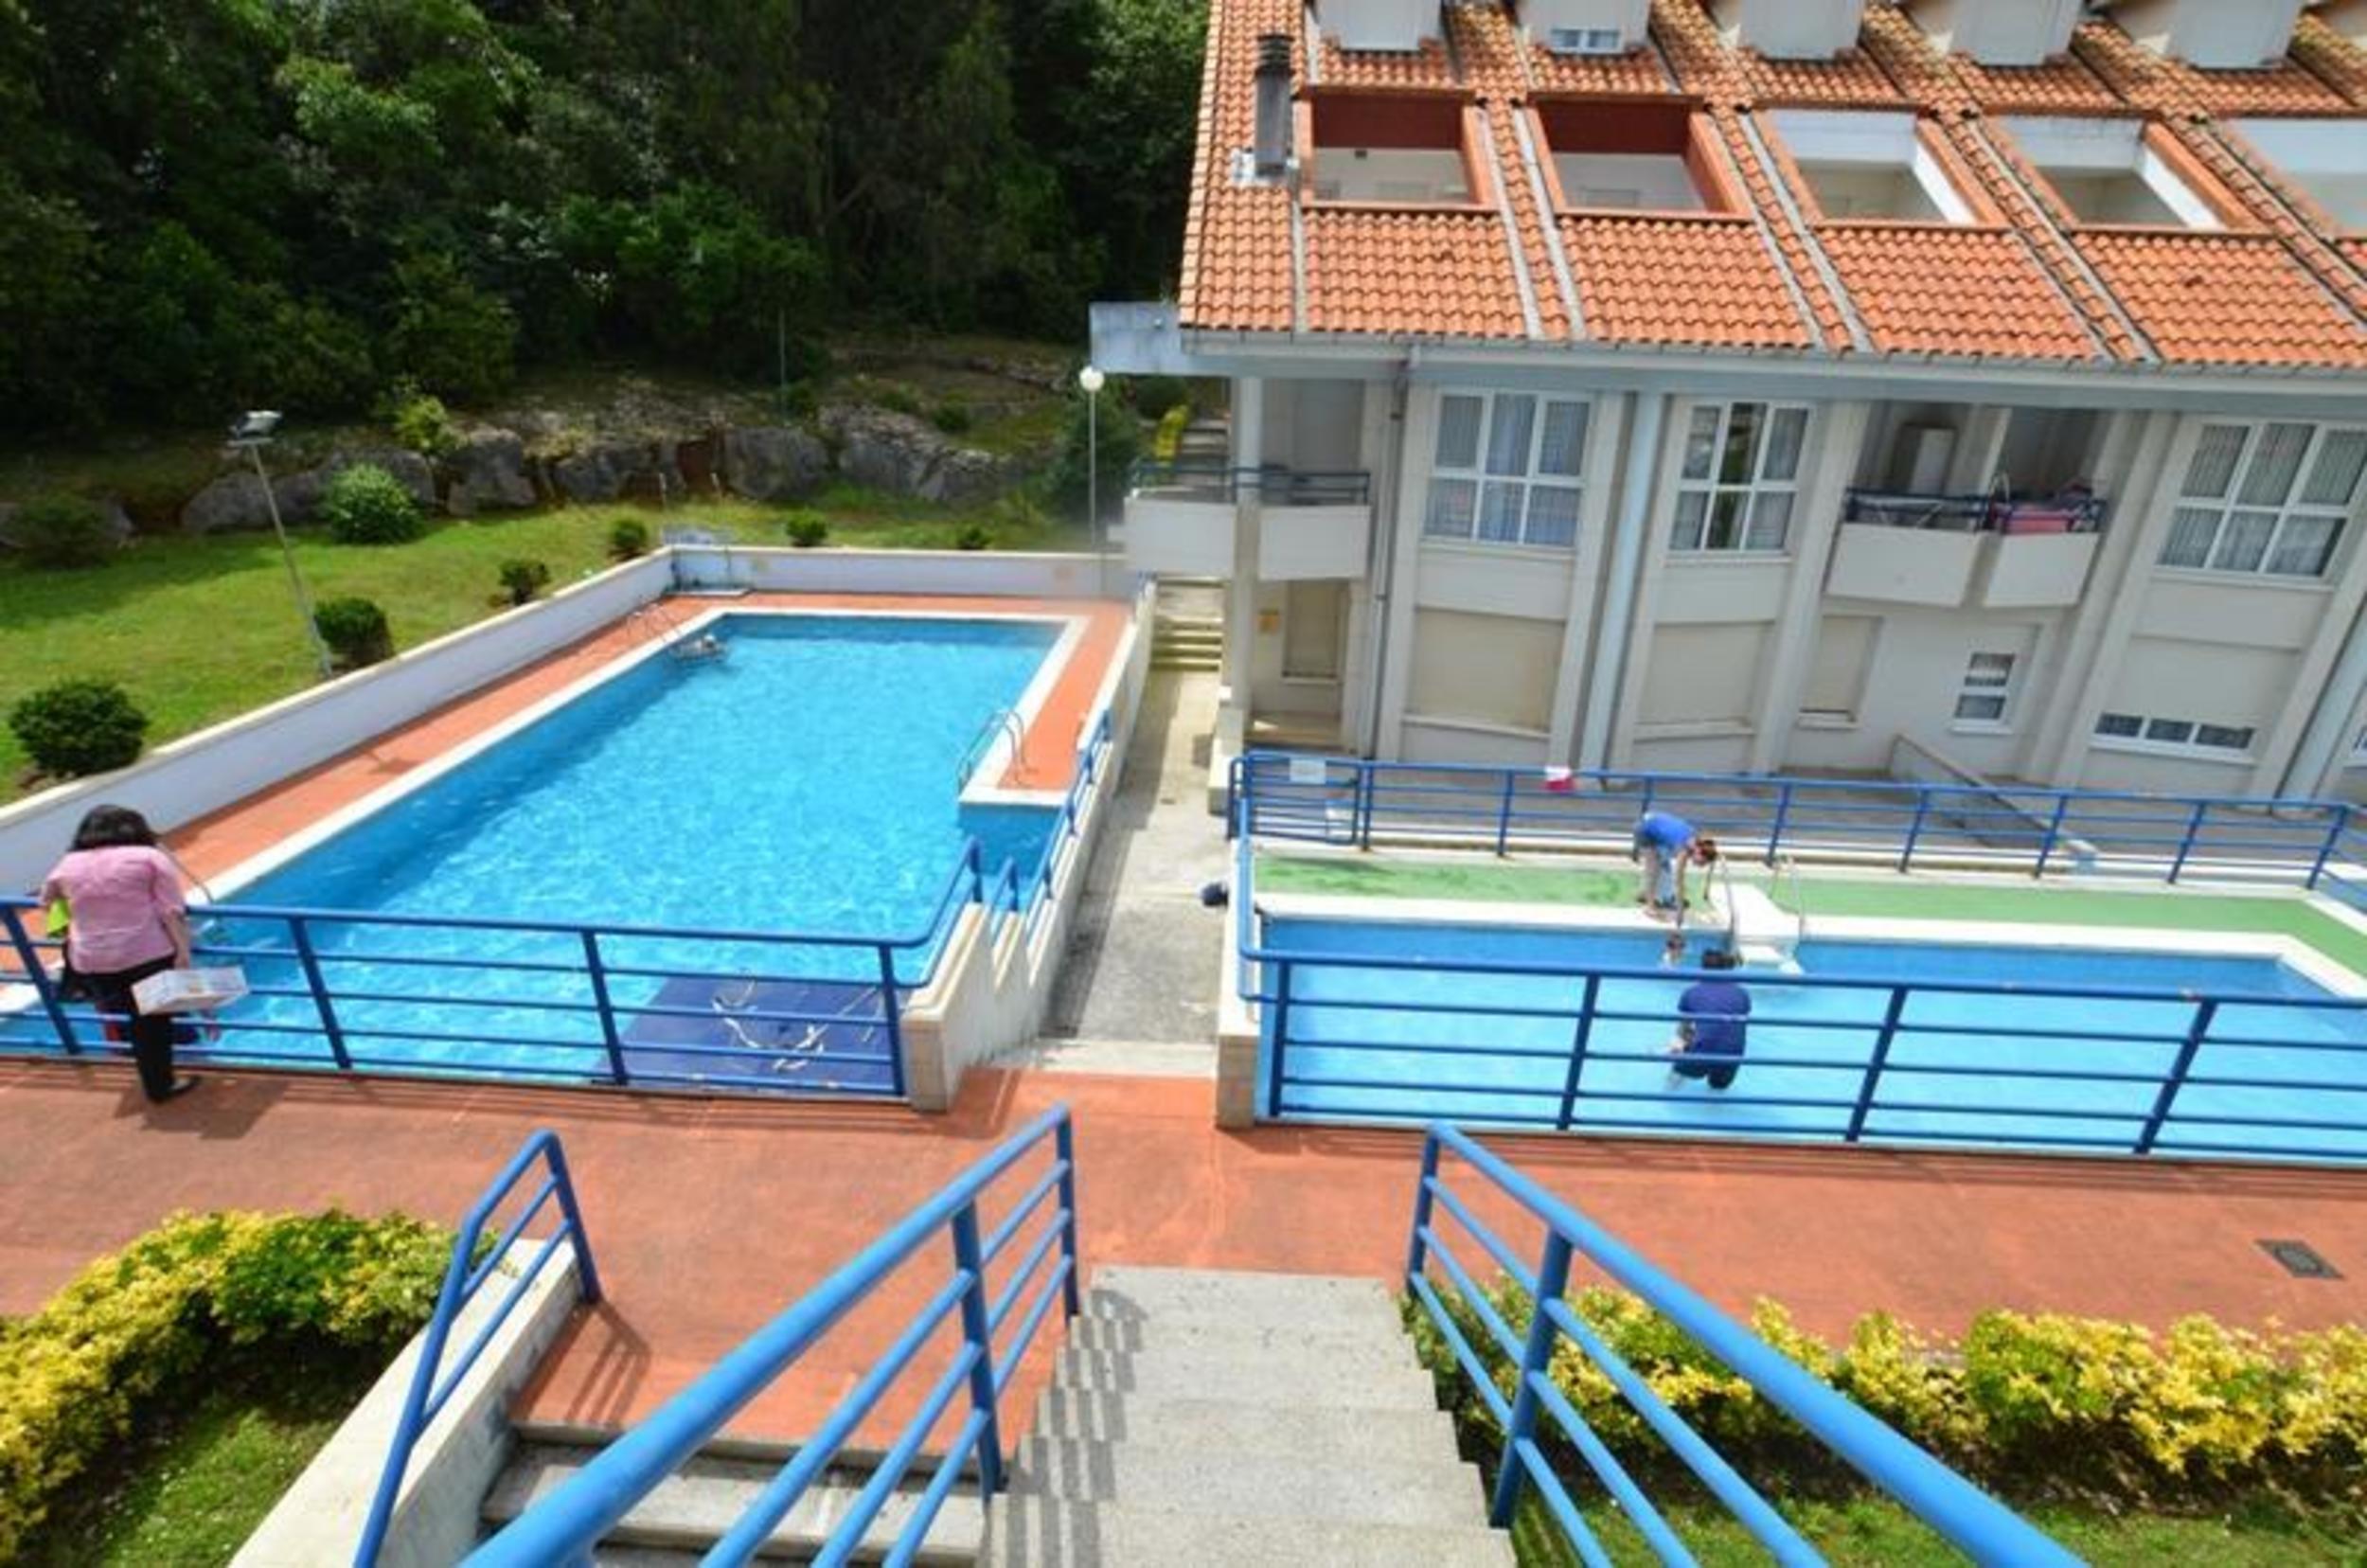 Ferienwohnung Apartment - 2 Bedrooms with Pool and Sea views - 102761 (2360861), Isla, Costa de Cantabria, Kantabrien, Spanien, Bild 4